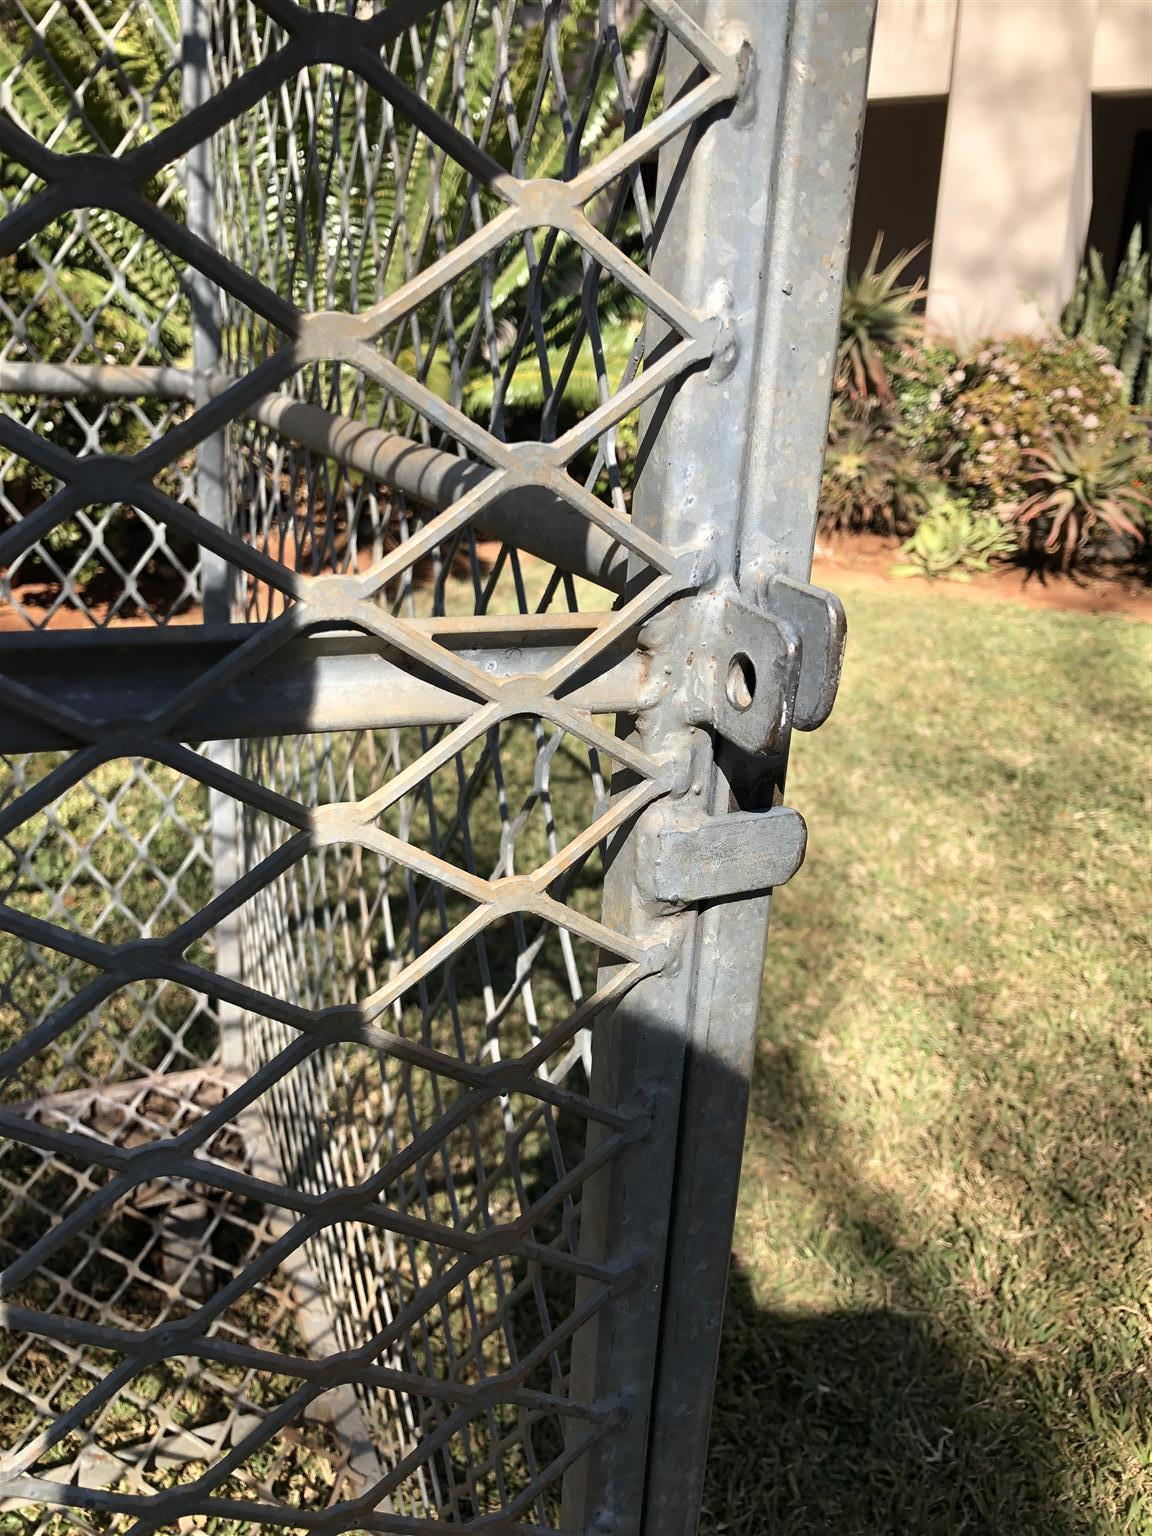 Galvanized steel rabbit cage for sale.